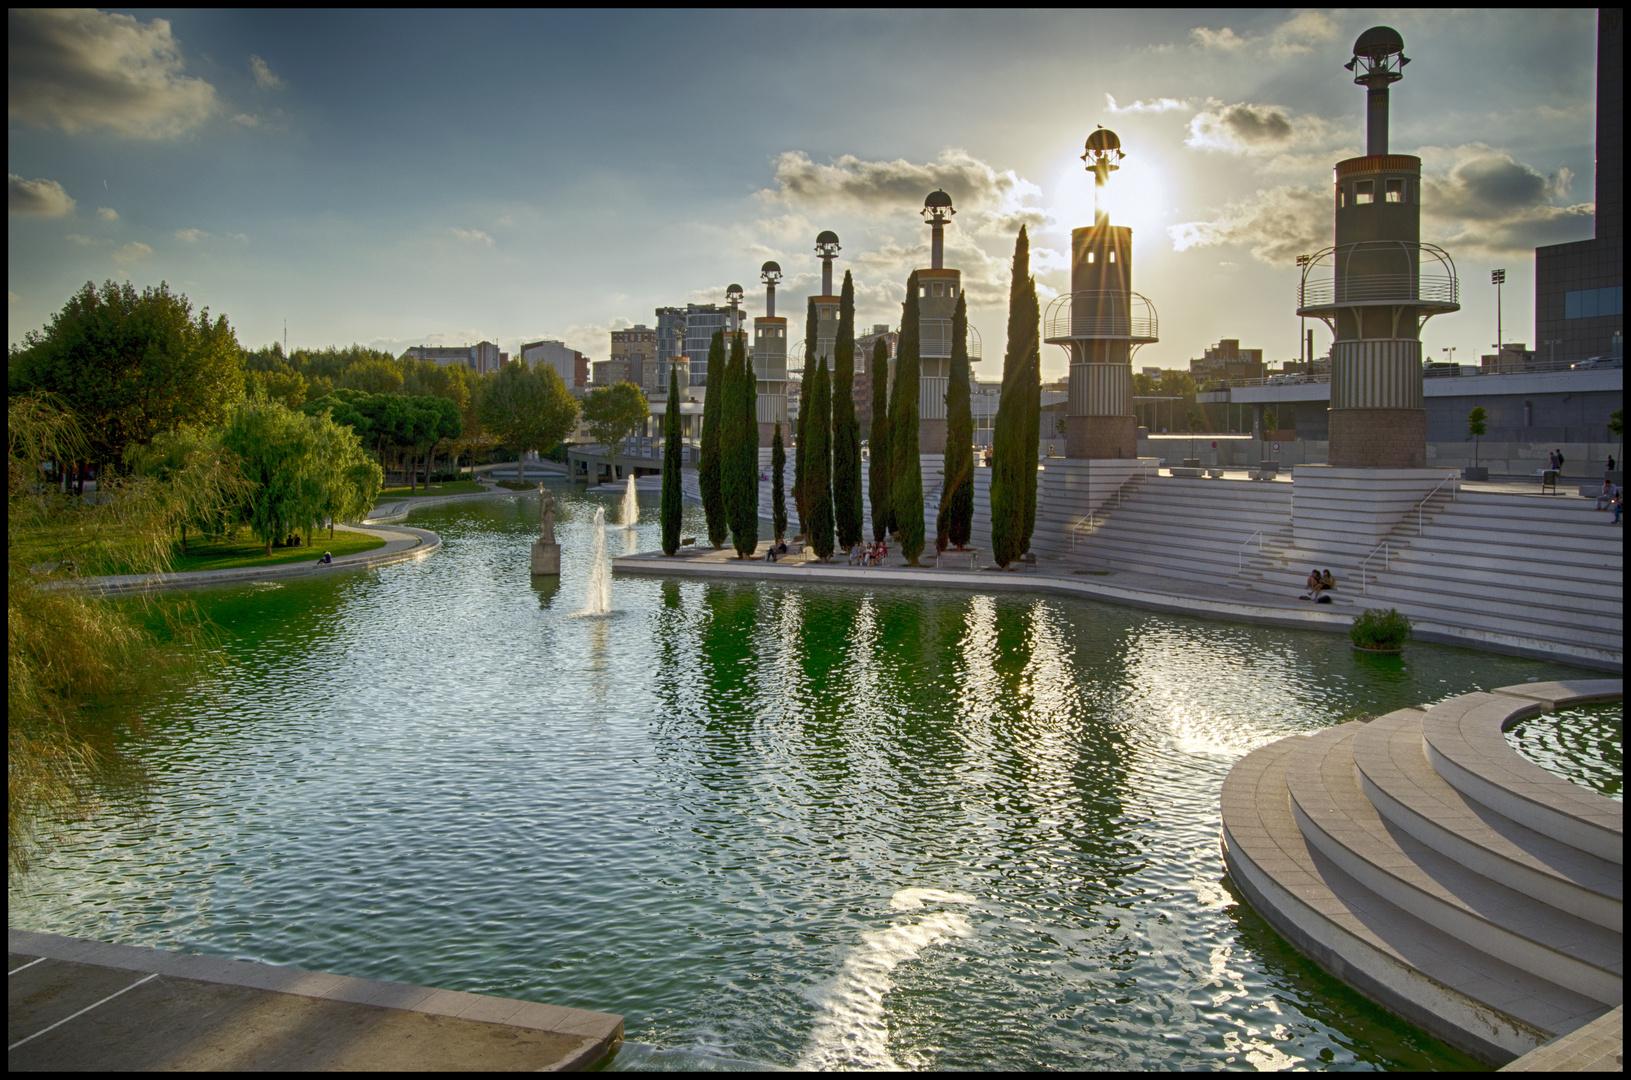 Barcelona Parc Espanya Industrial